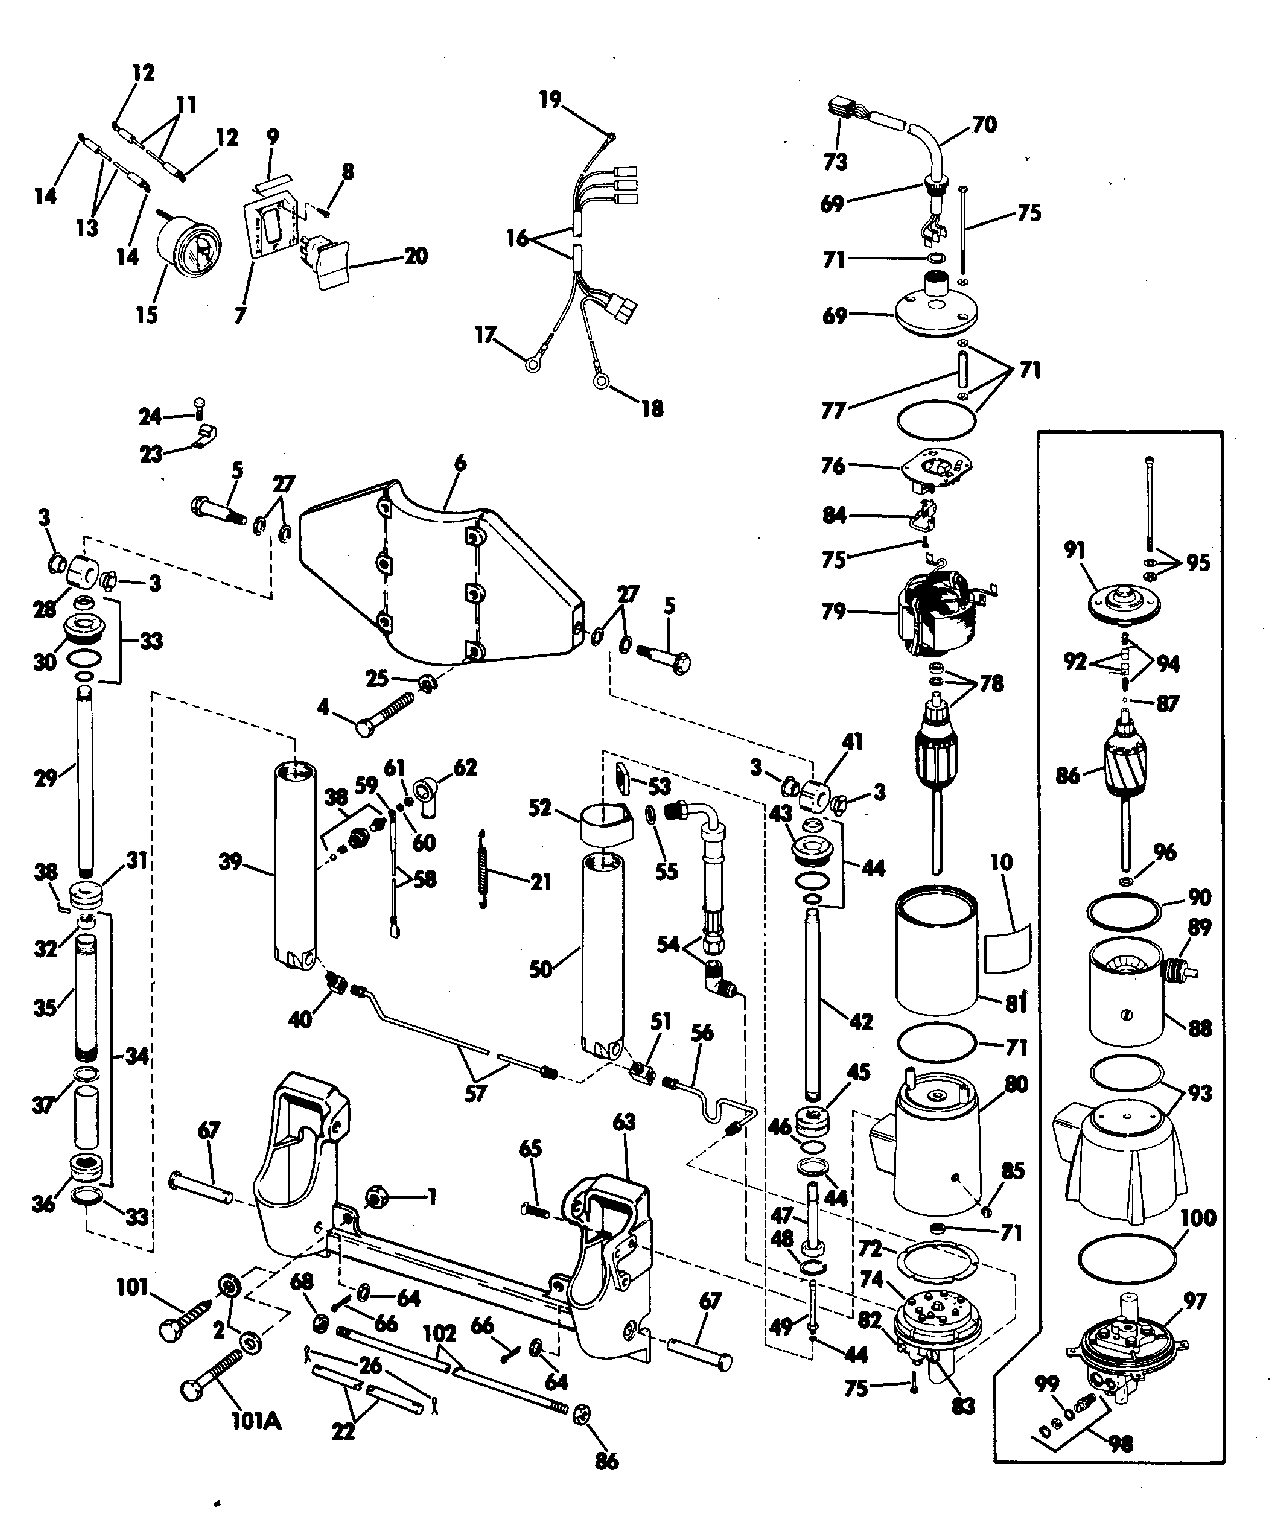 1988 yamaha banshee wiring diagram 1988 suzuki lt250 wiring diagram wiring diagram